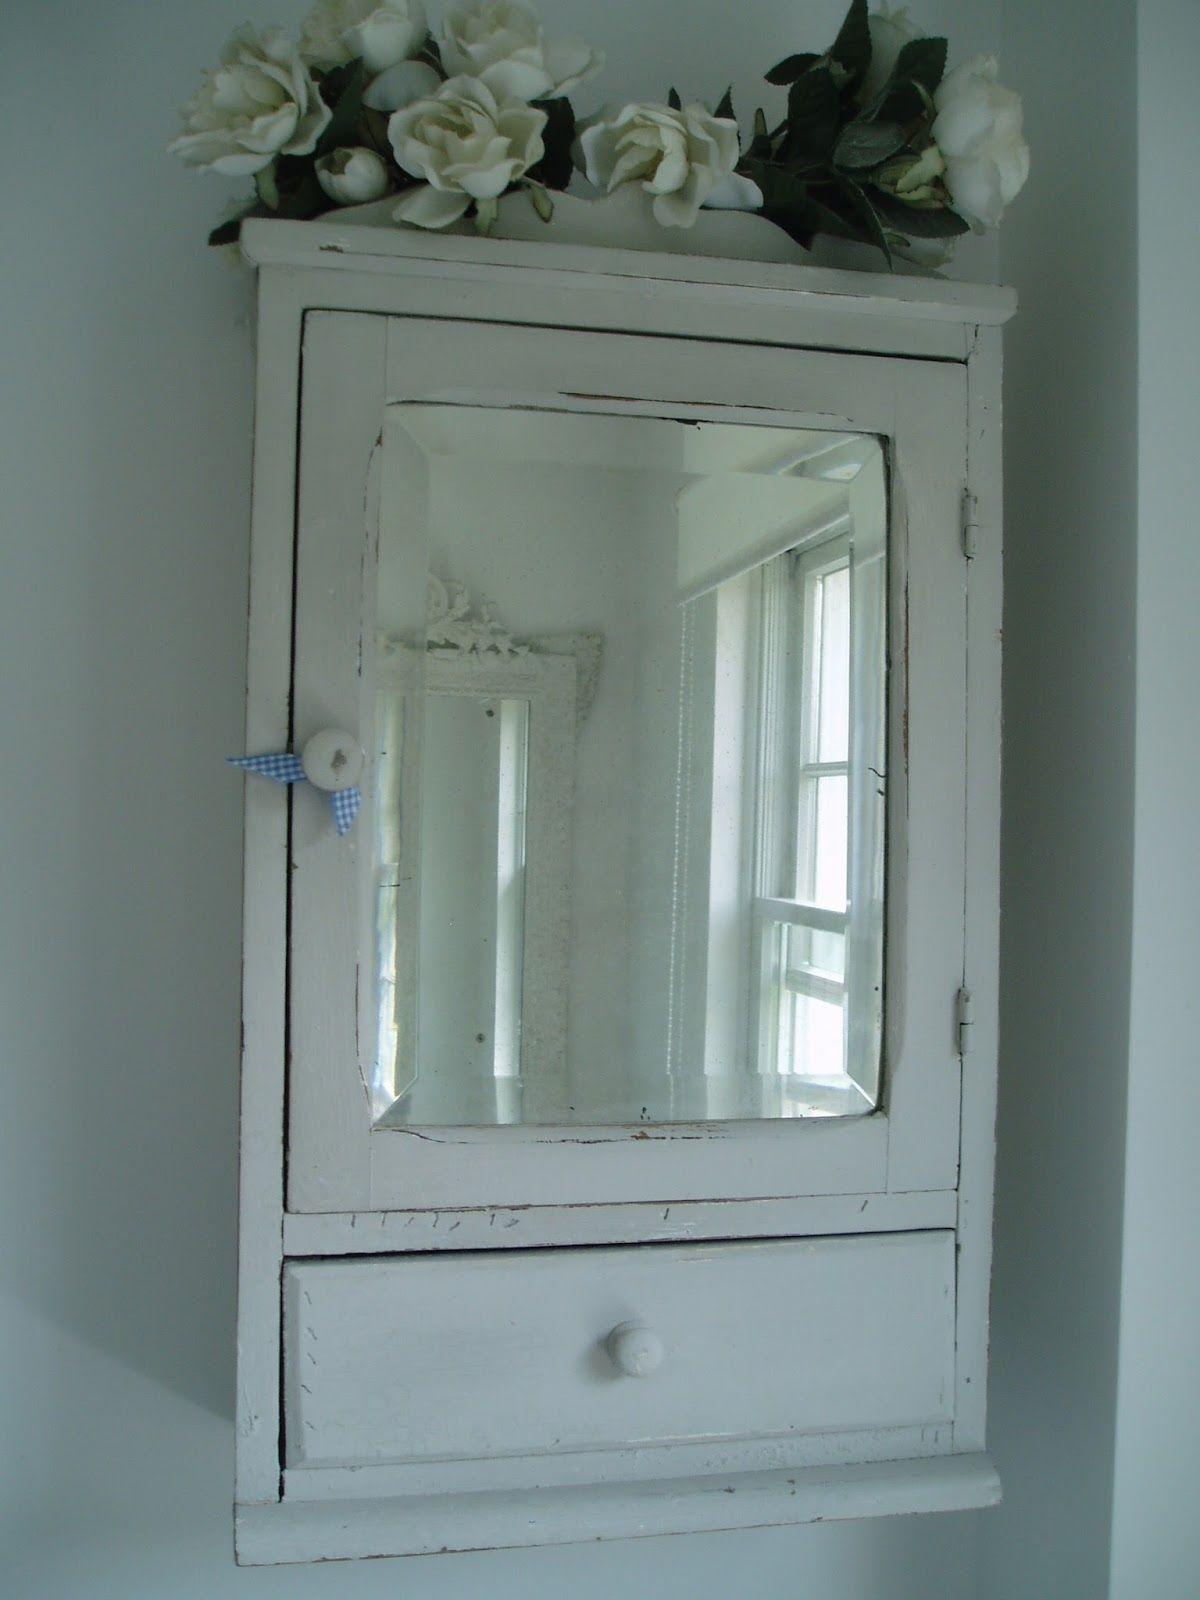 Vintage Style Bathroom Mirror Cabinet - Vintage Style Bathroom Mirror Cabinet Http://drrw.us Pinterest